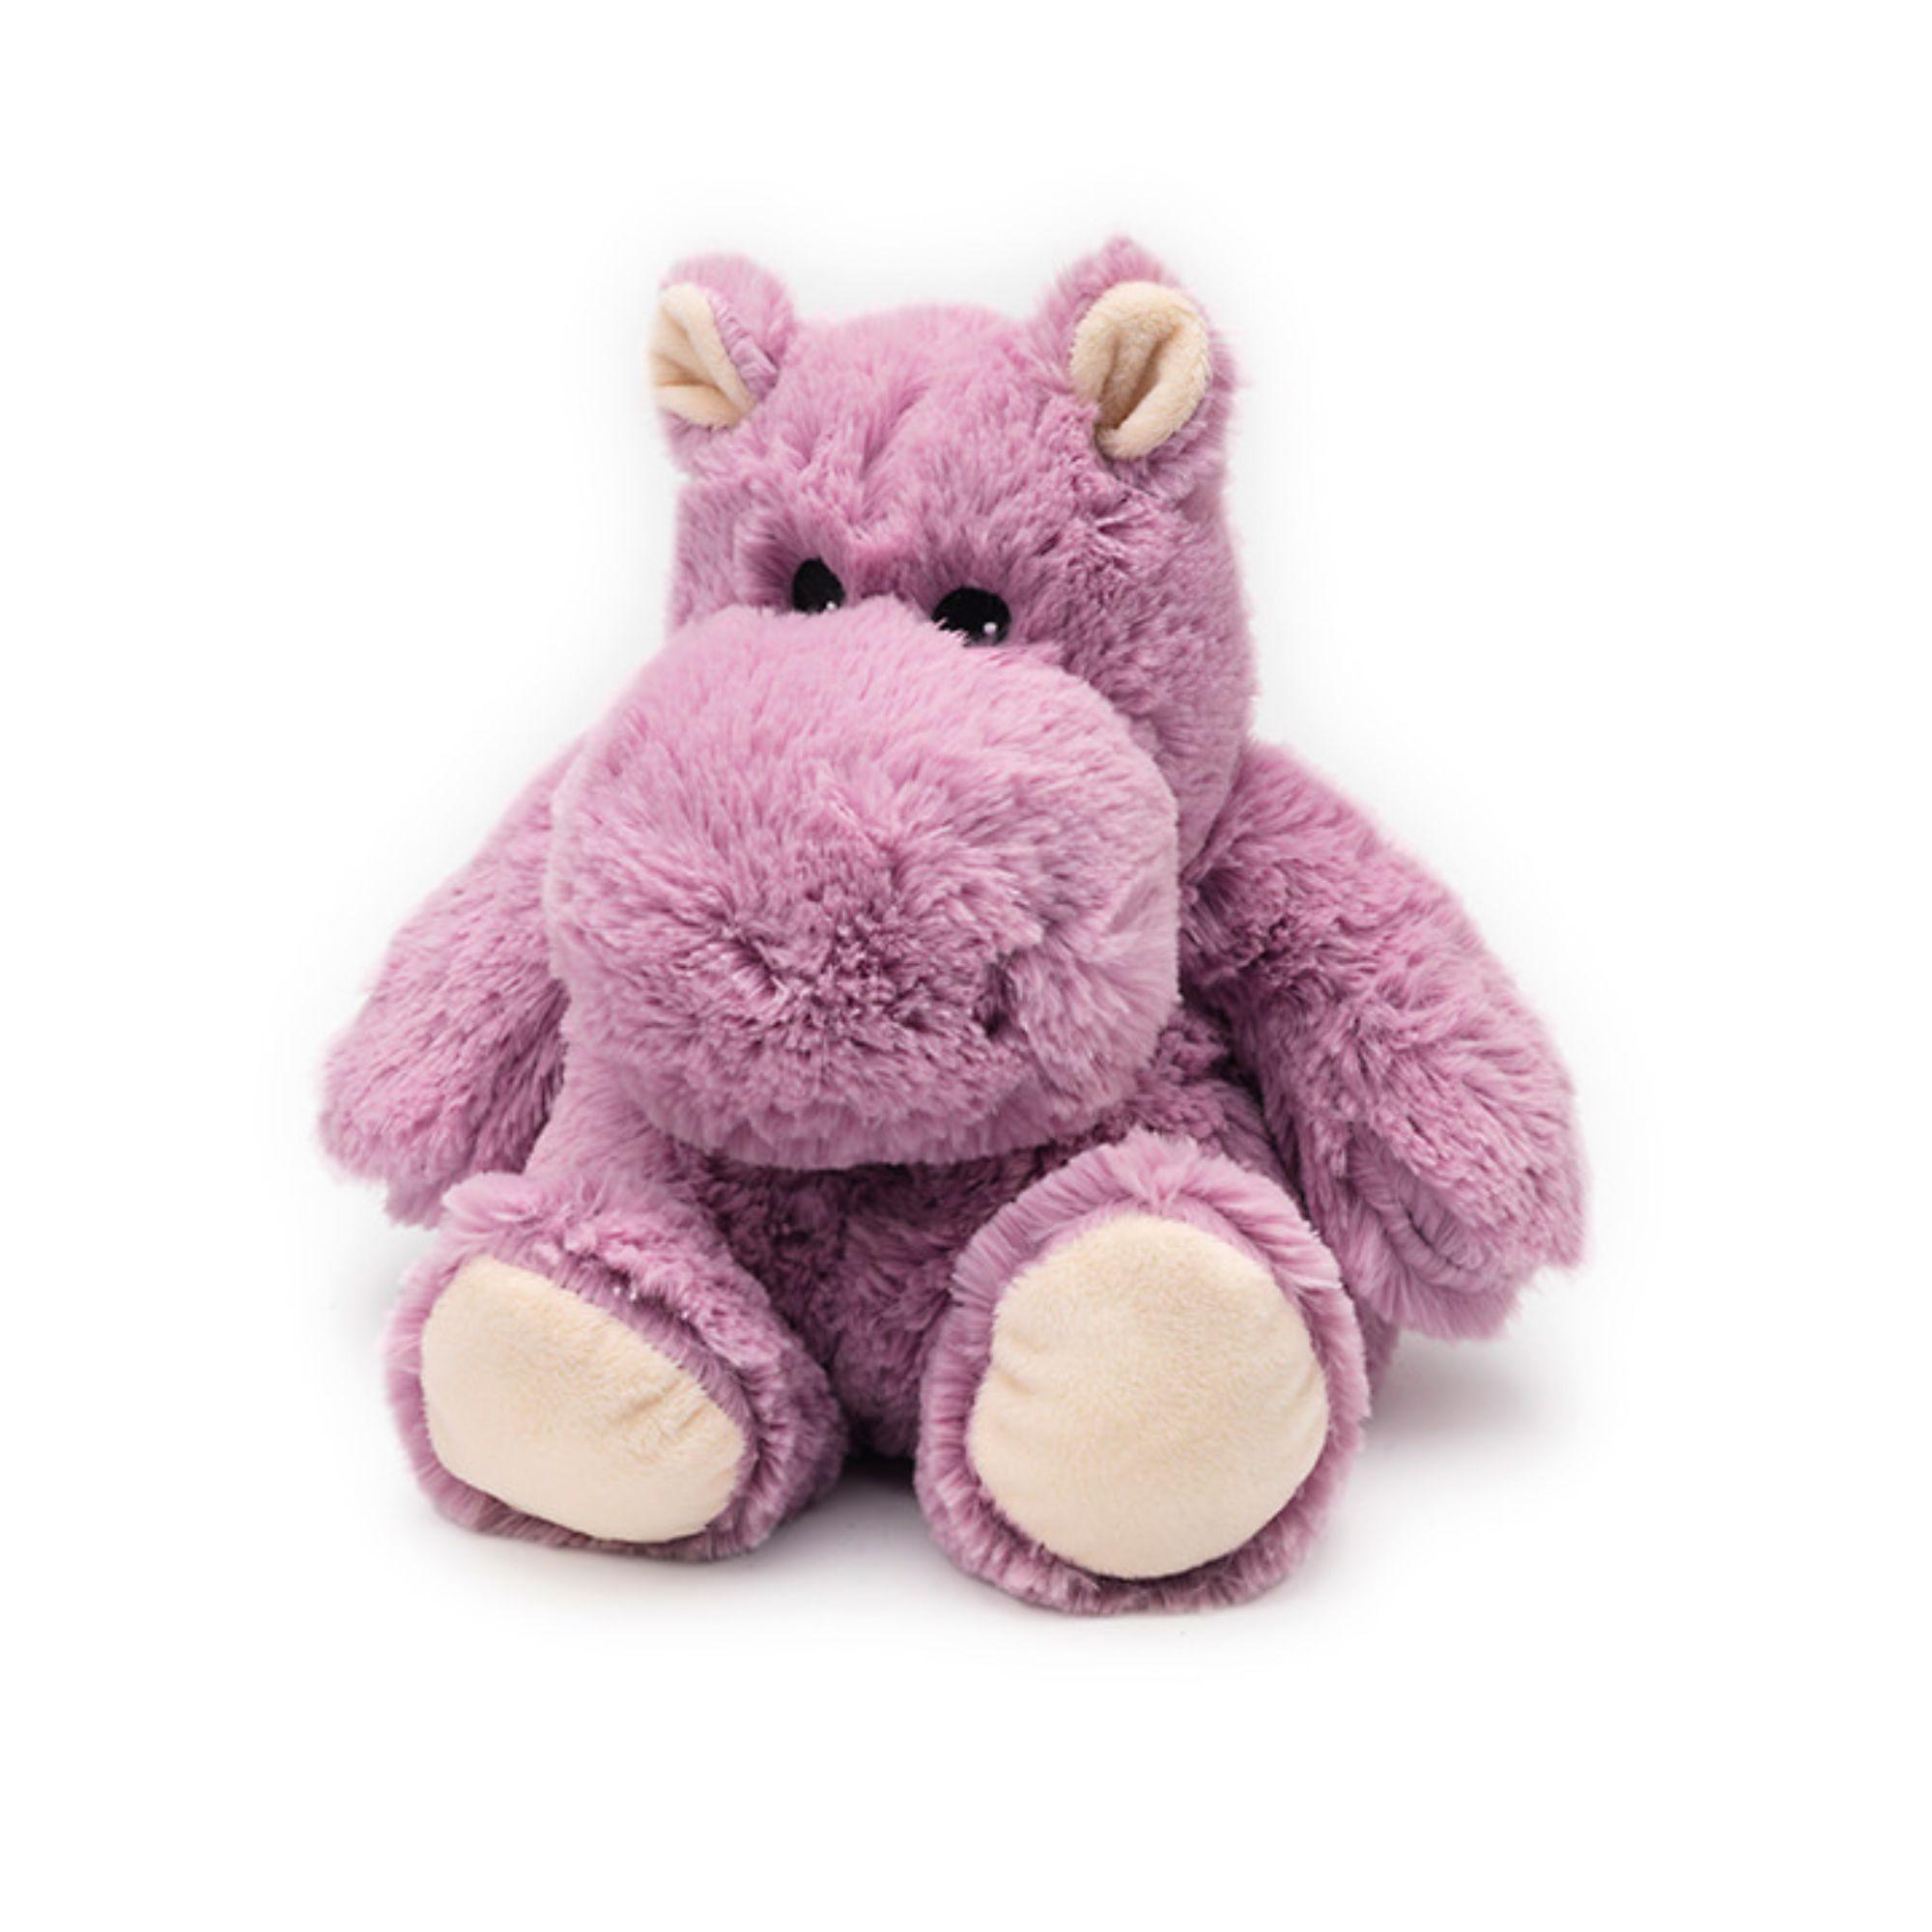 "13"" Pink and White Microwavable Plush Hippopotamus Stuffed"